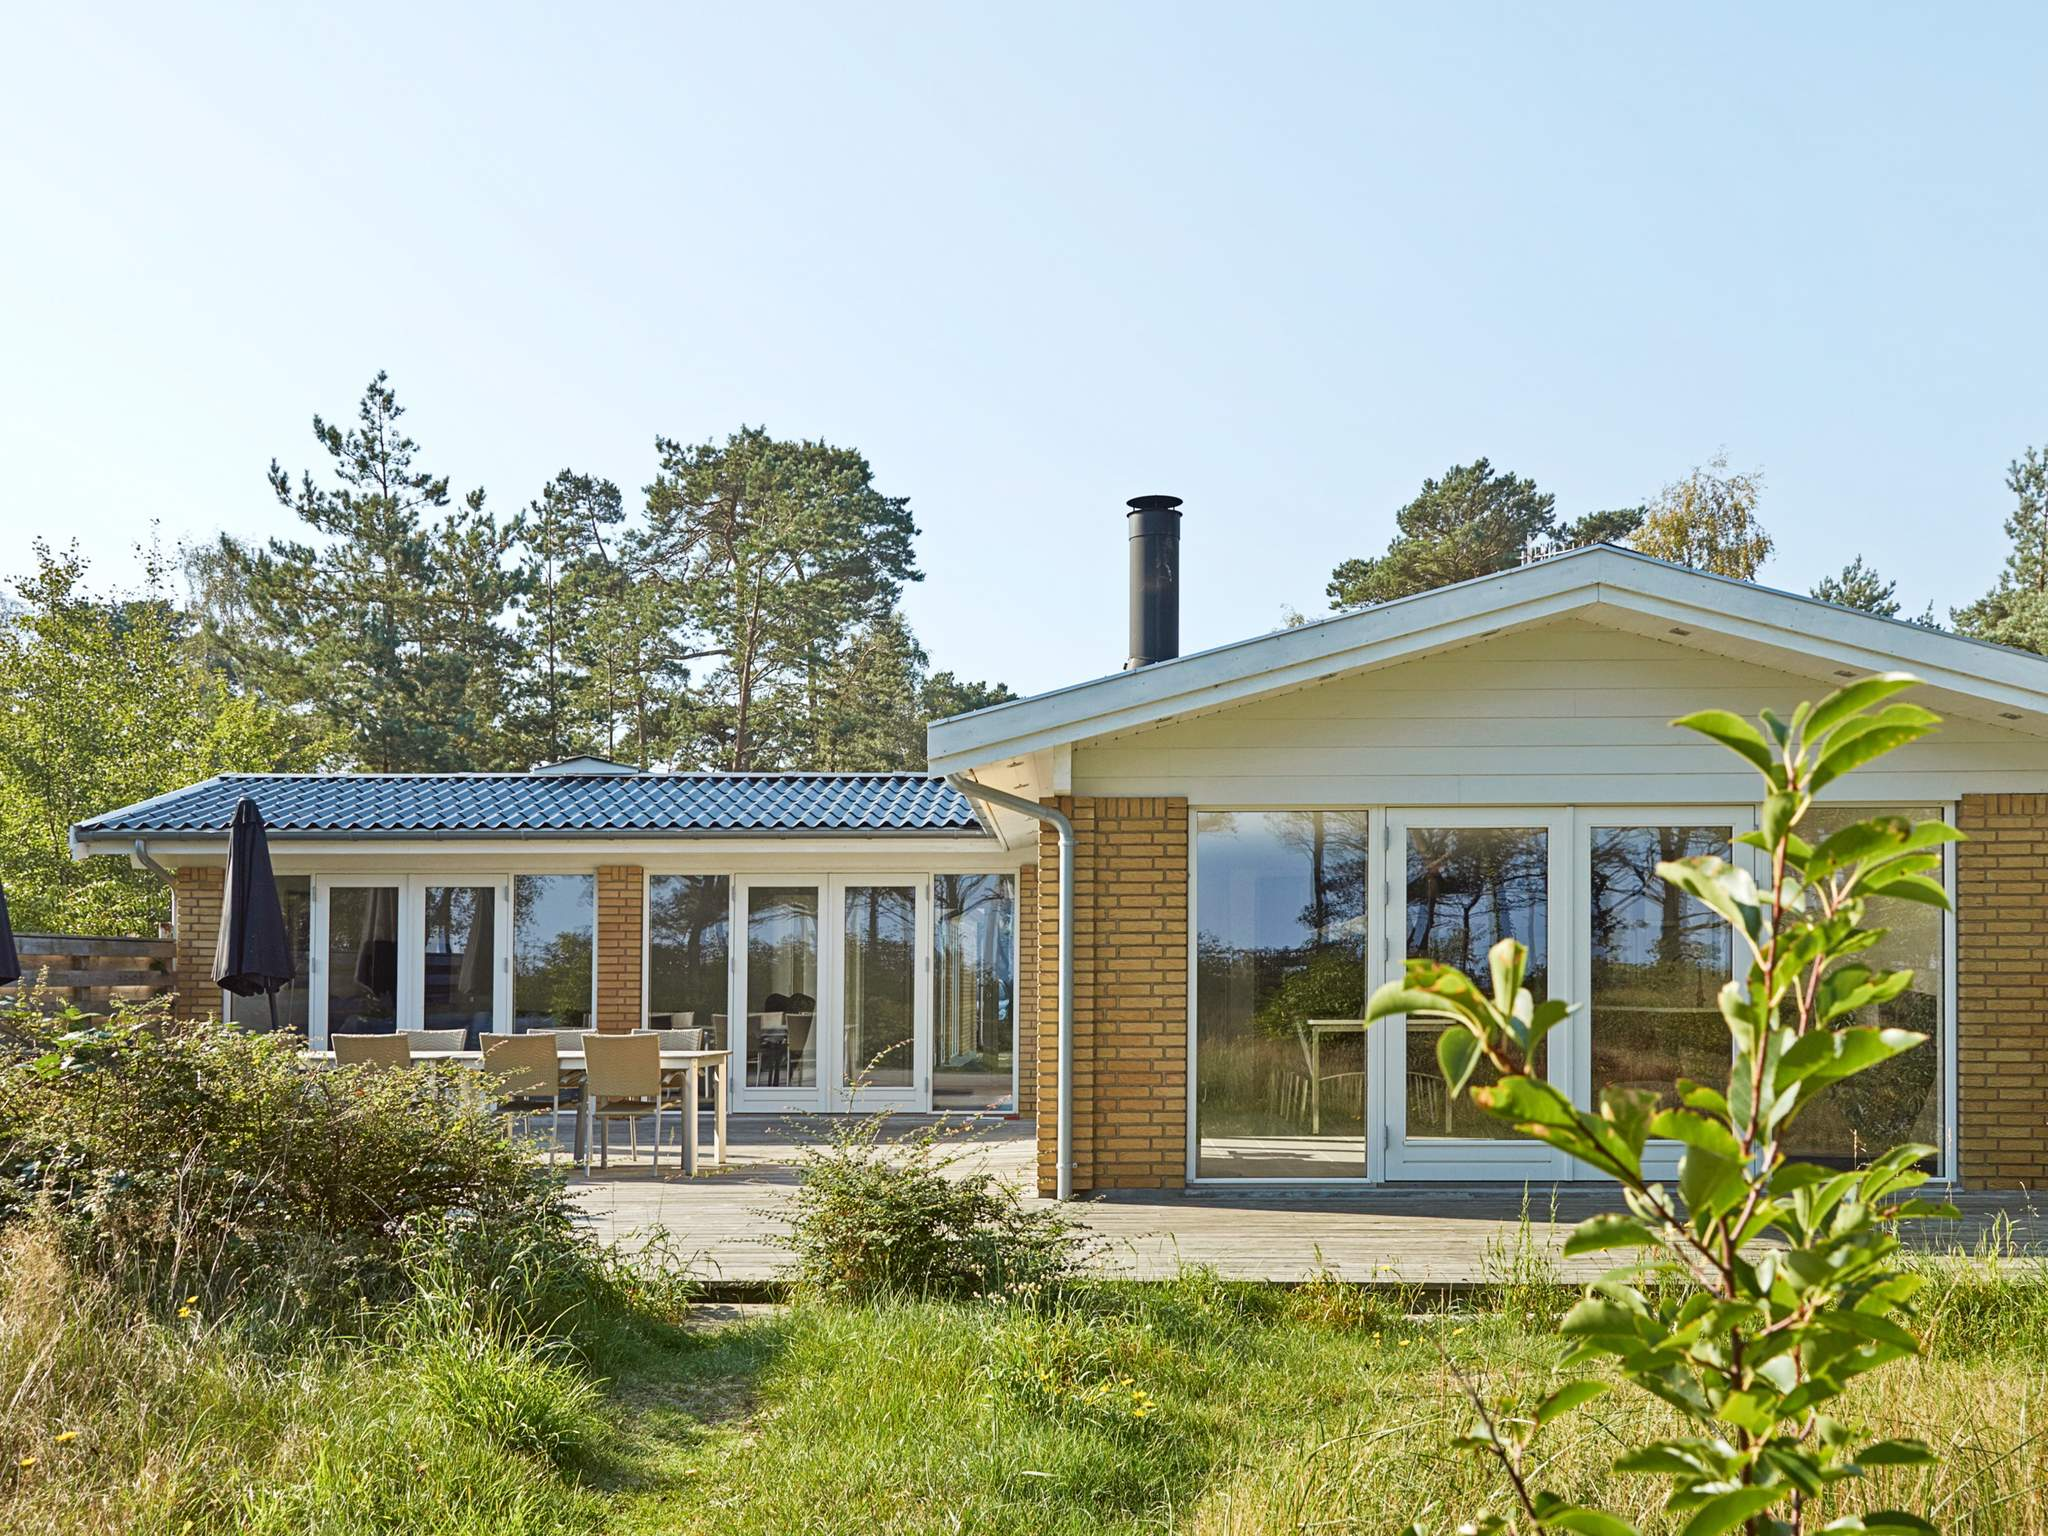 Ferienhaus Balka Strand (586595), Balke, , Bornholm, Dänemark, Bild 1